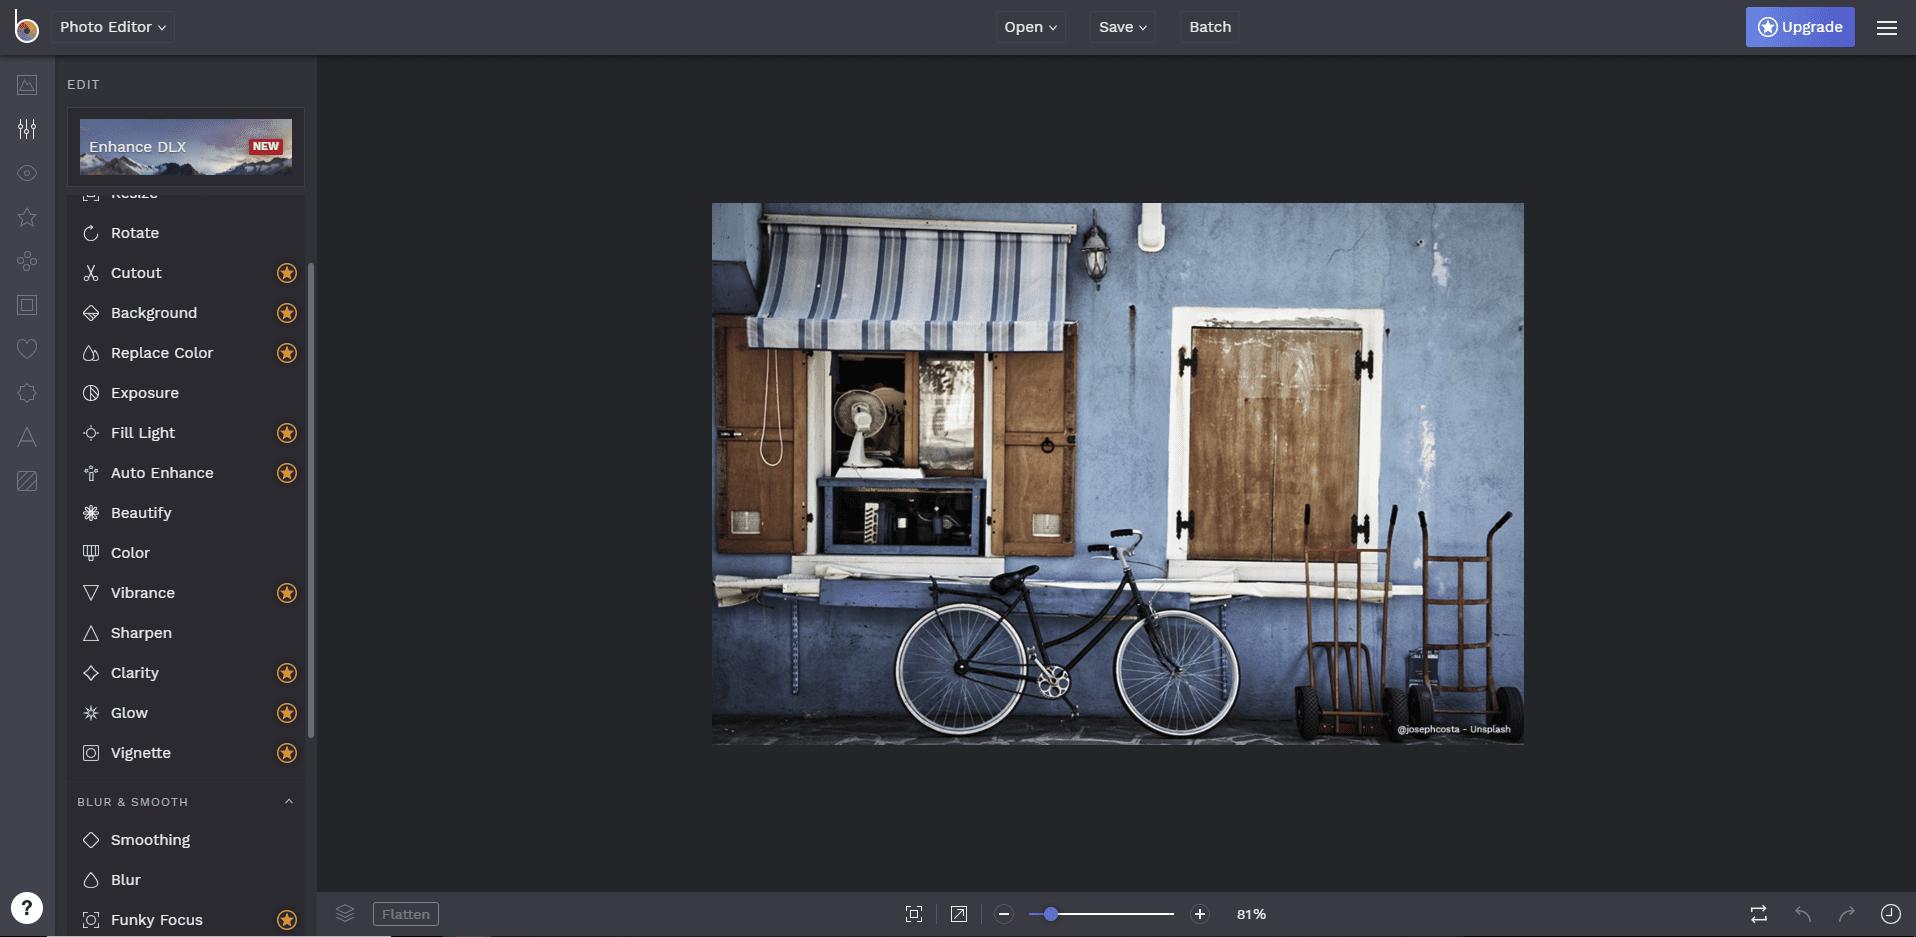 Free online photo editor - Befunky